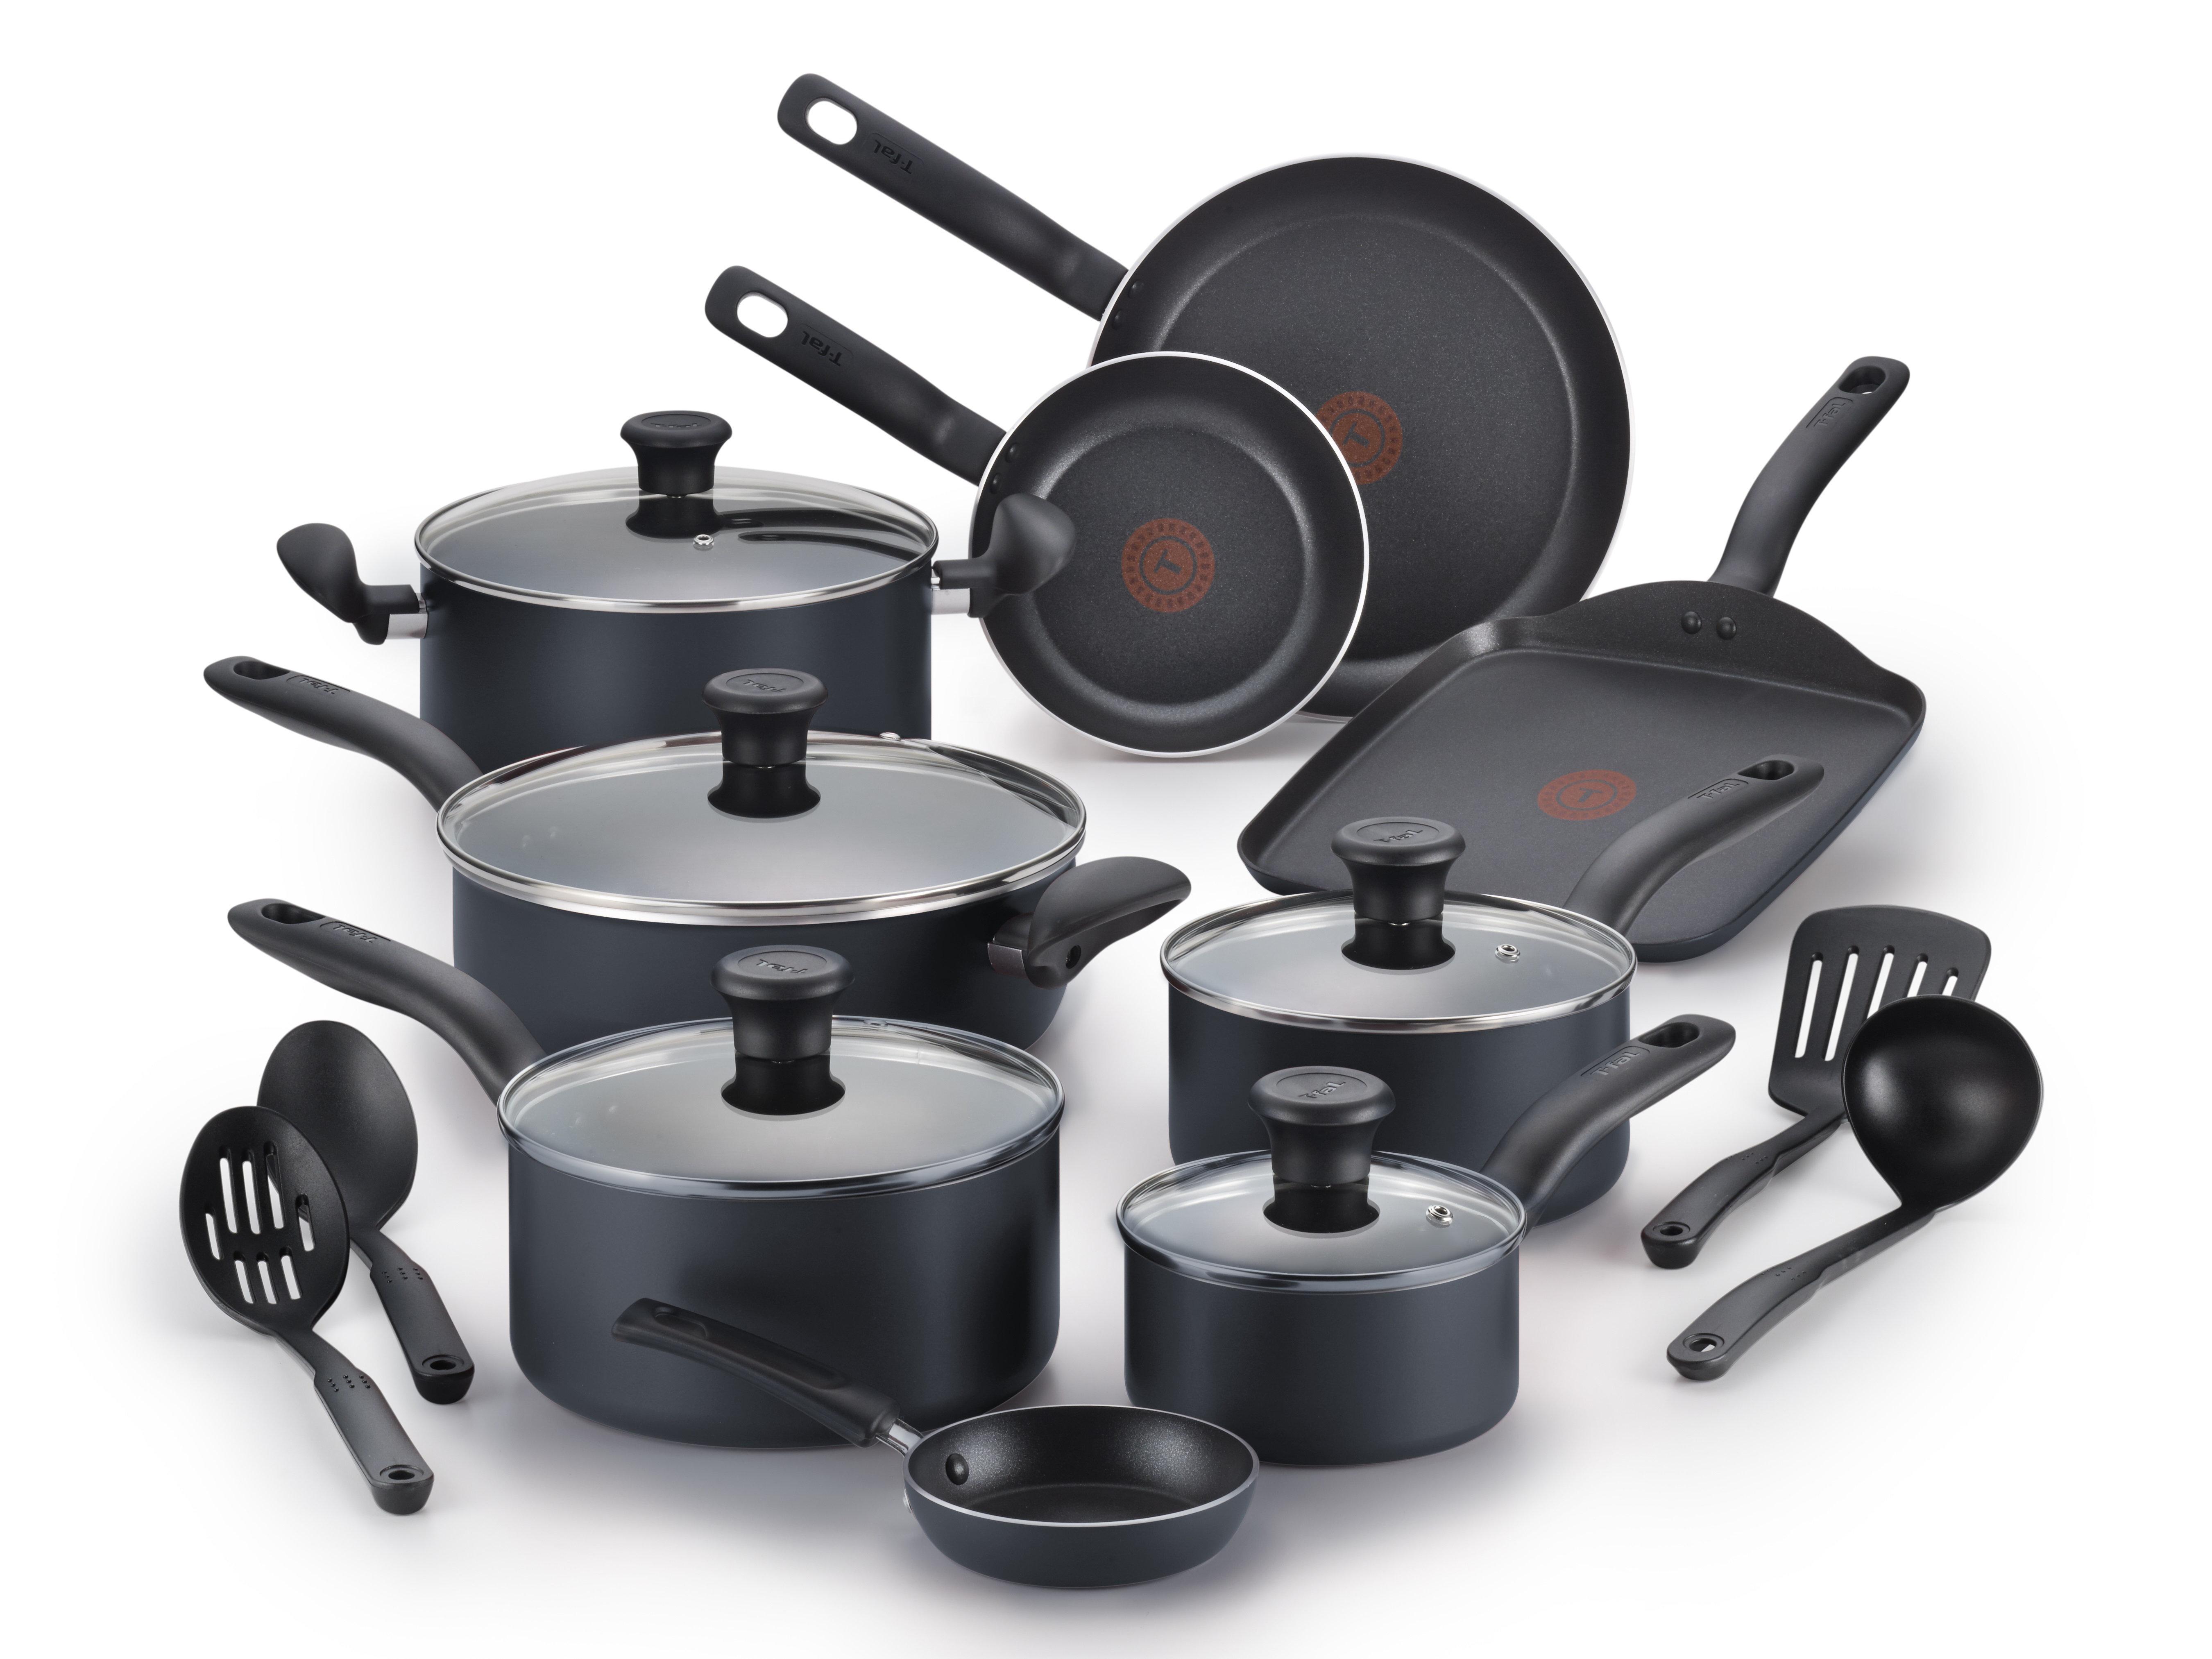 T Fal Initiatives 18 Piece Non Stick Cookware Set Reviews Wayfair